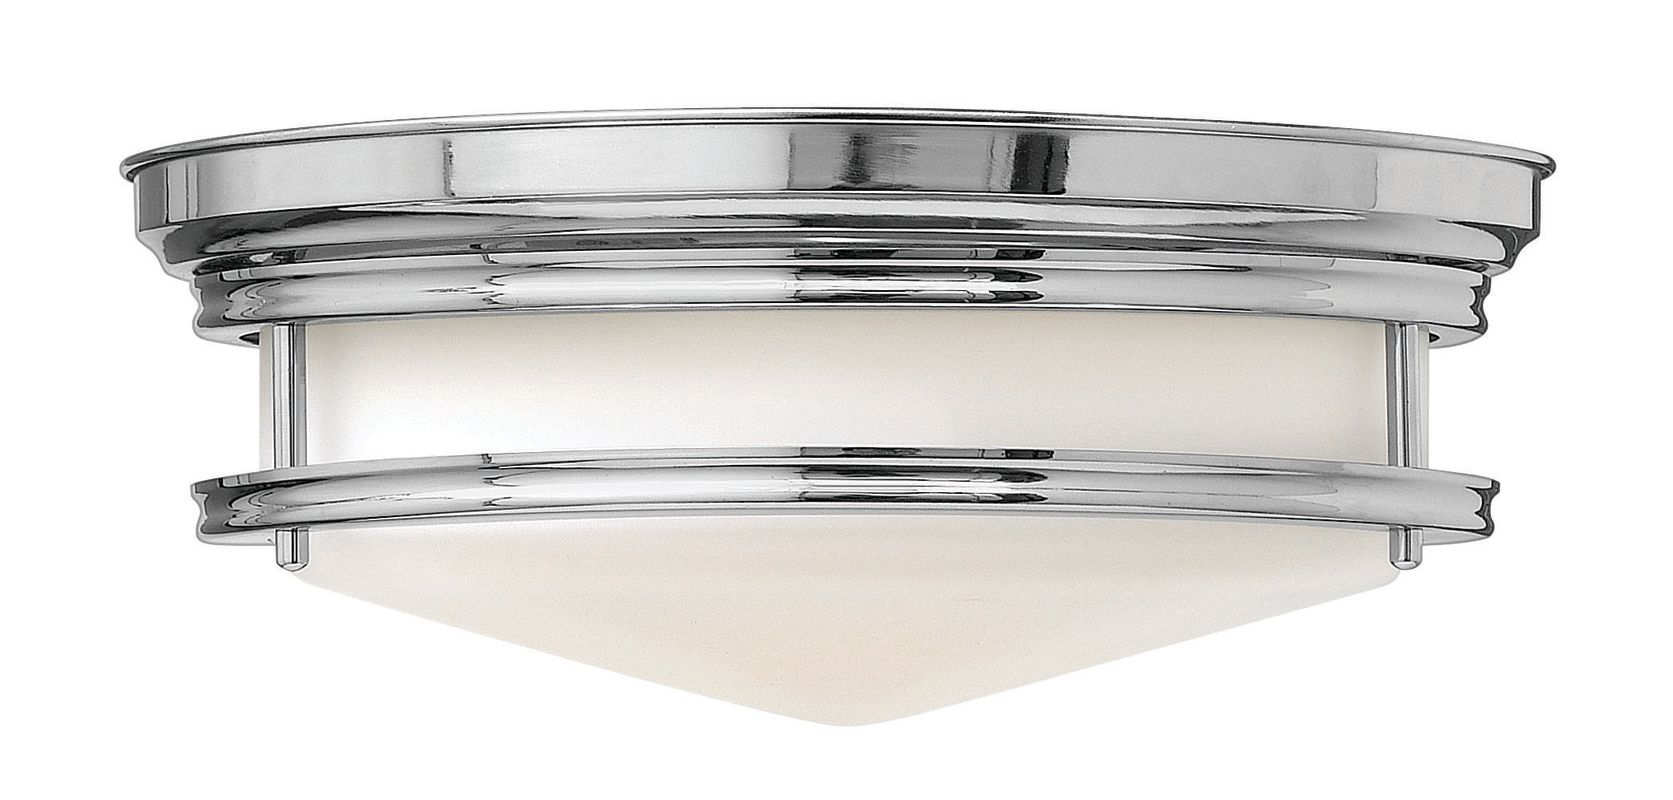 Hinkley Lighting 3301-GU24 3 Light Title 24 Fluorescent Flush Mount Sale $269.00 ITEM: bci2635251 ID#:3301CM-GU24 UPC: 640665330328 :